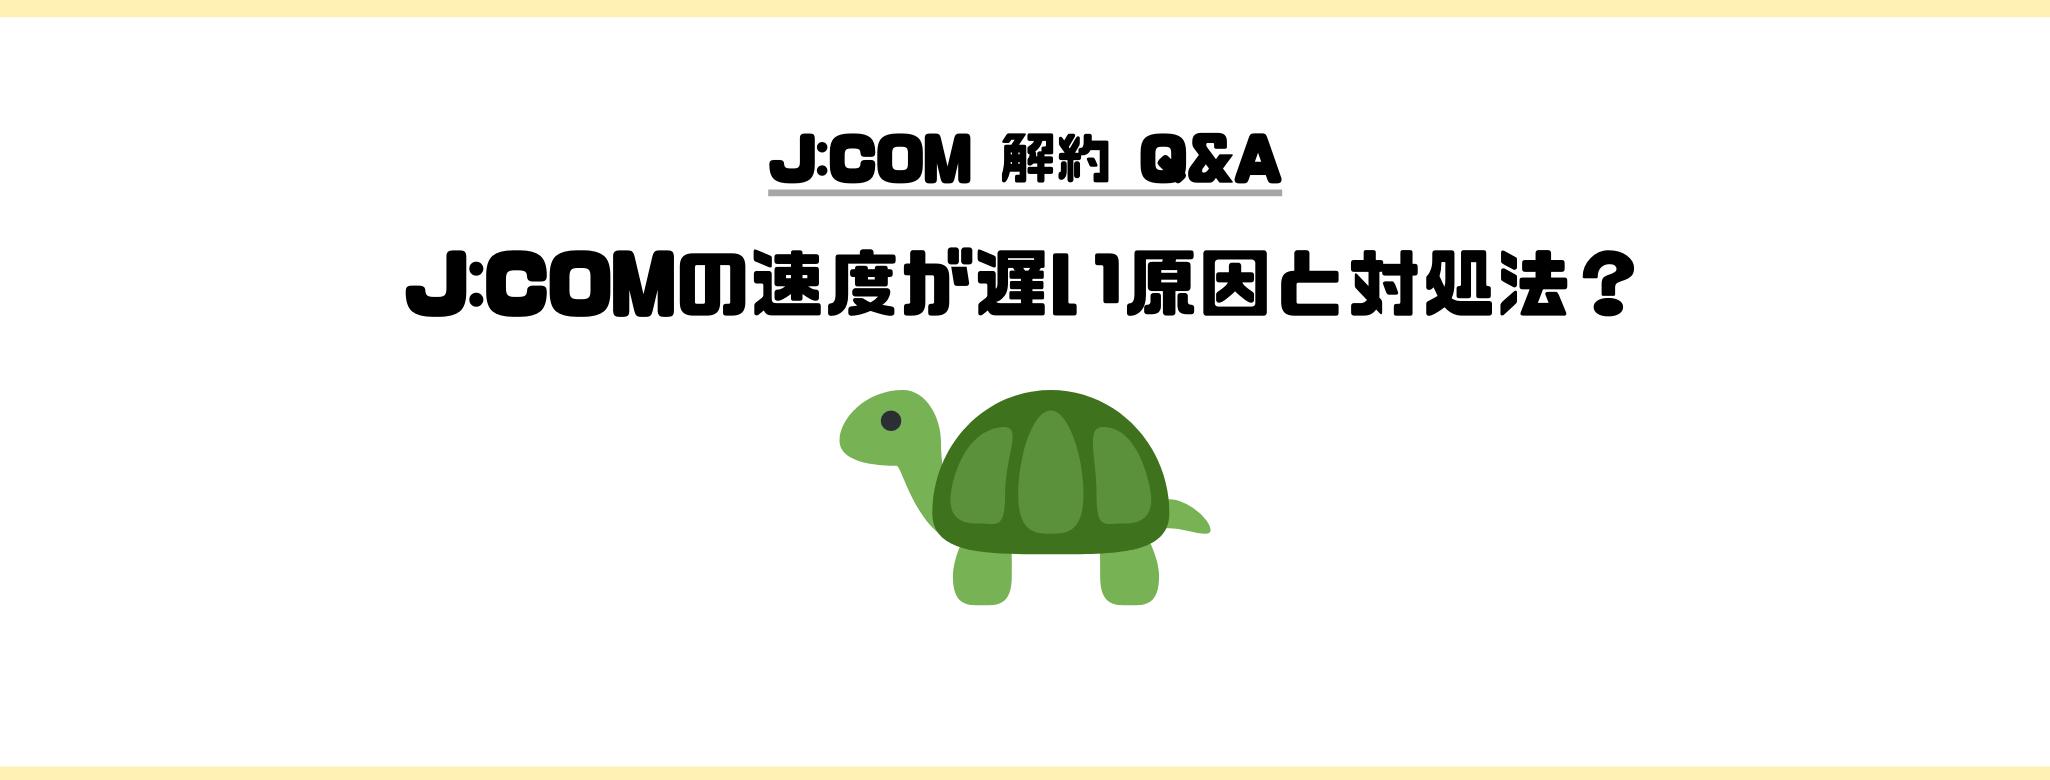 J:COM_解約_速度_遅い